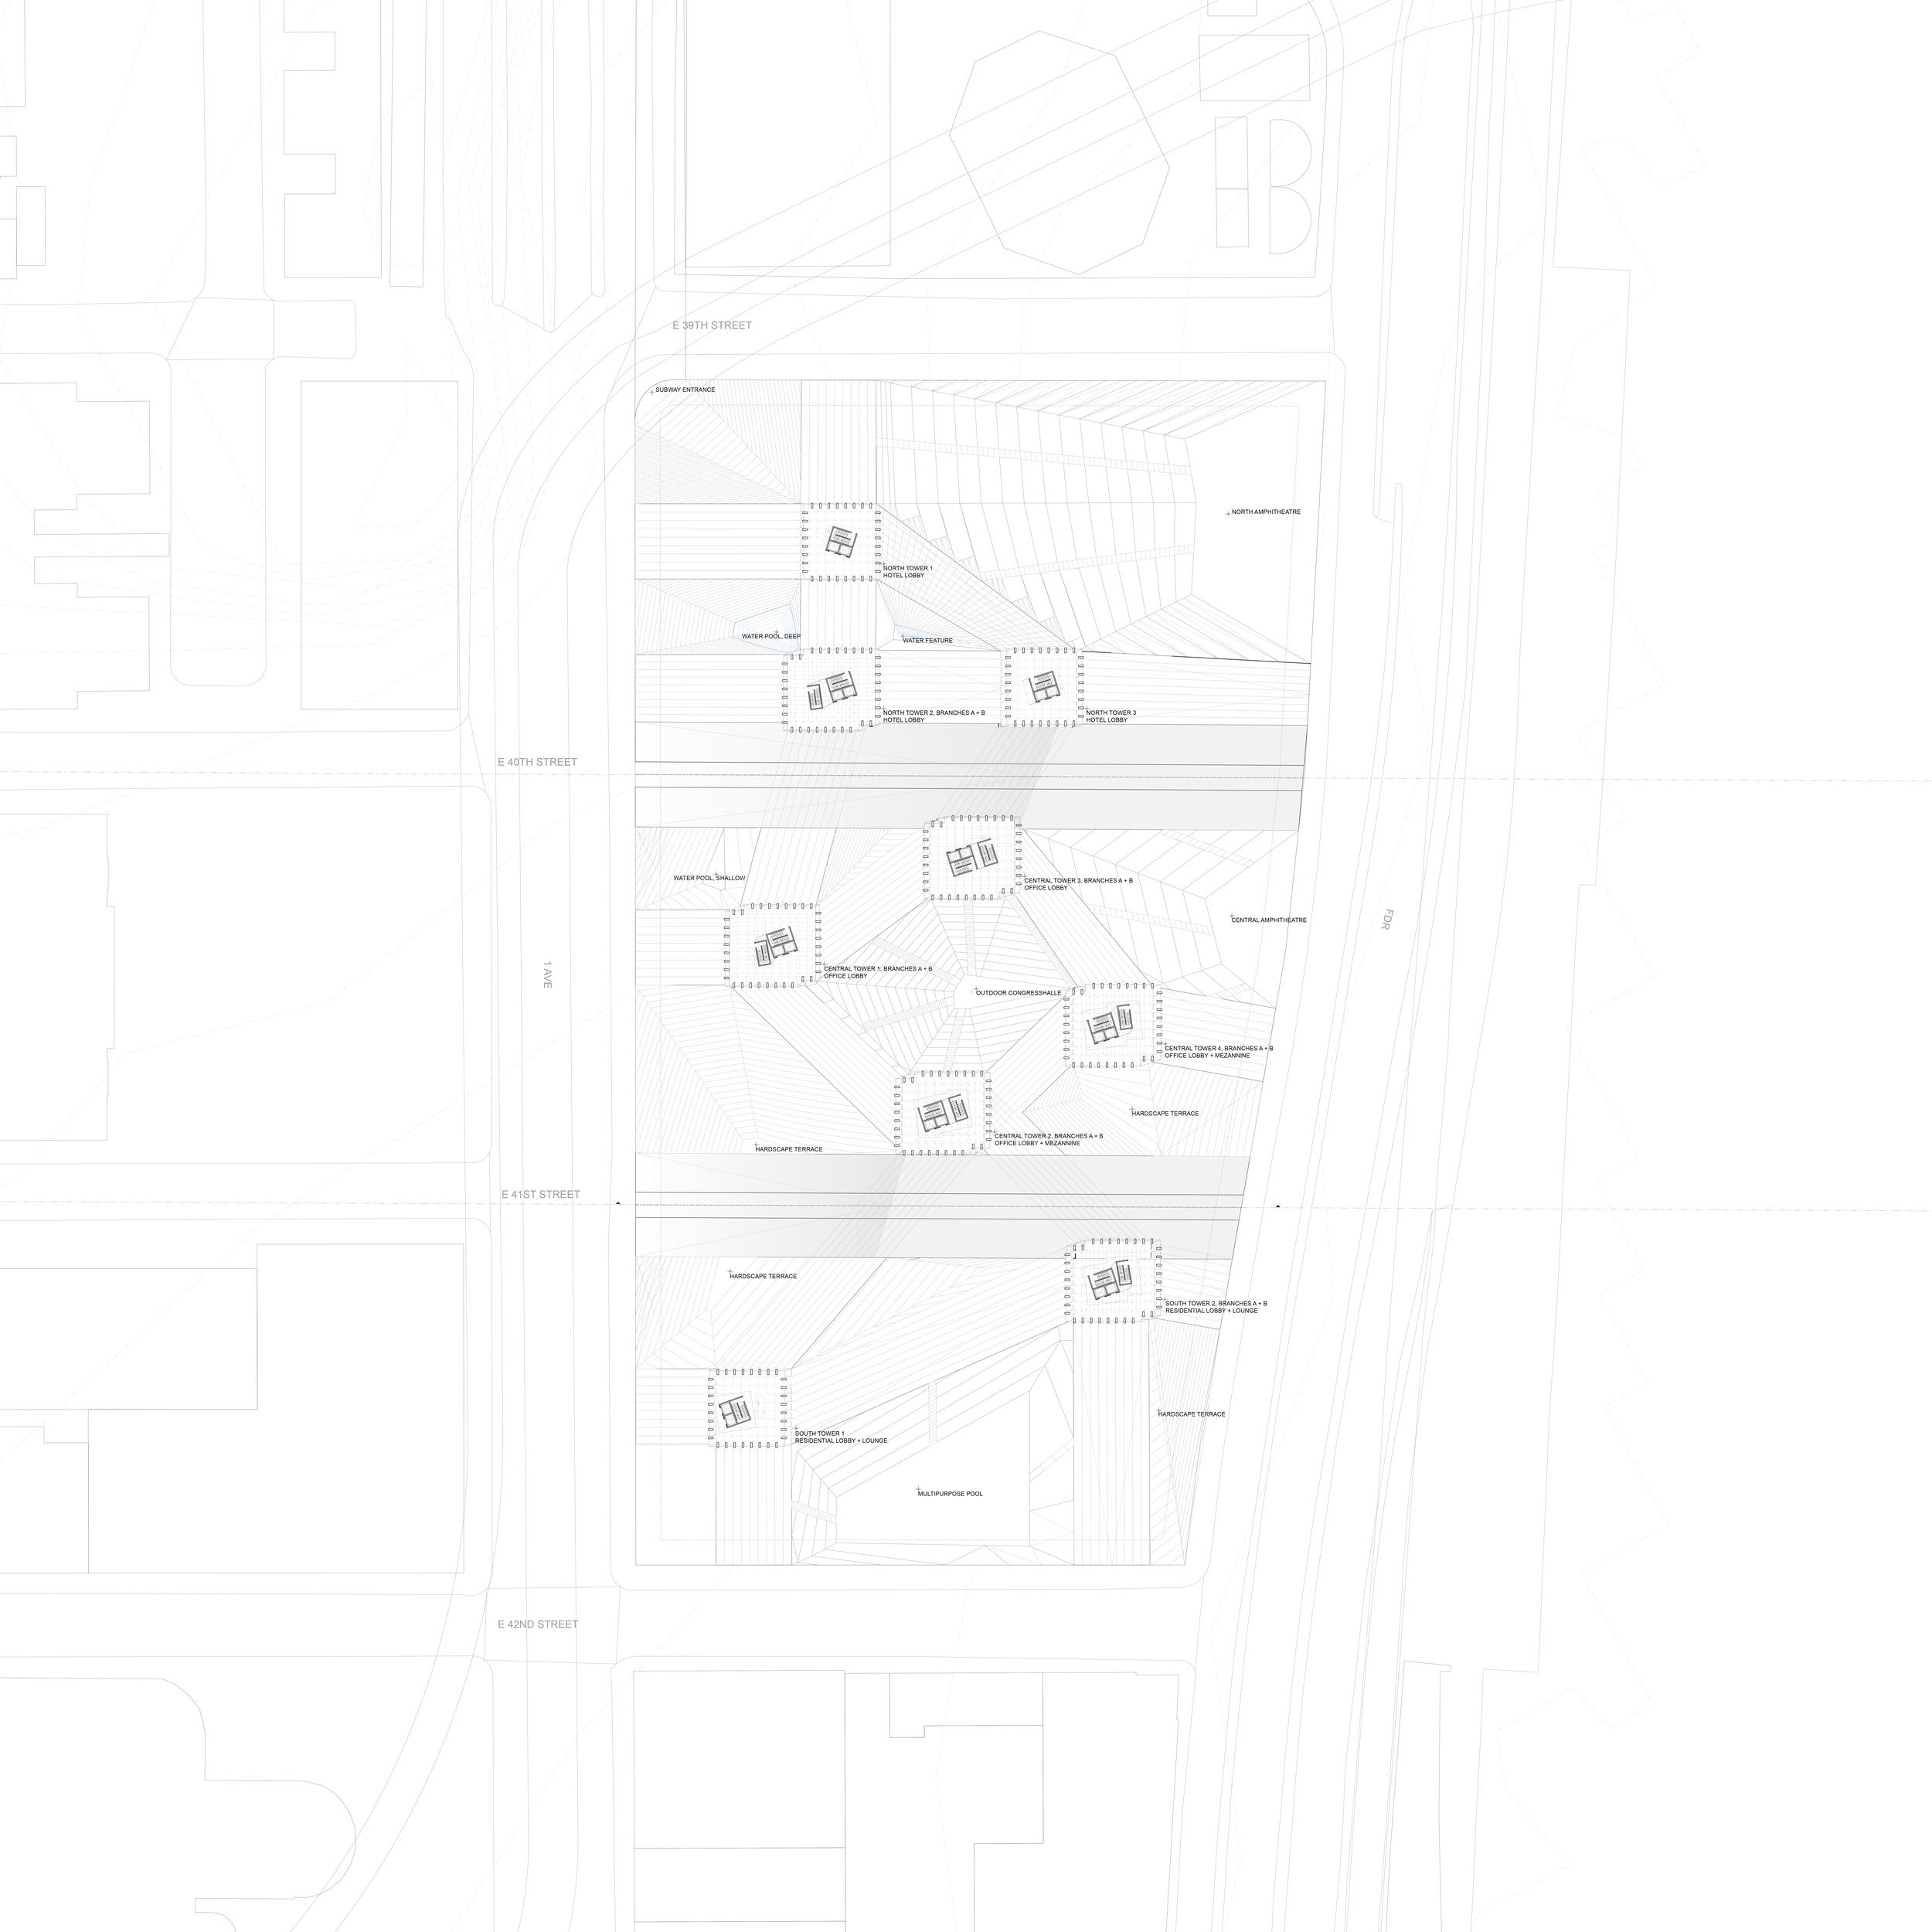 01_nmt_site plan.jpg